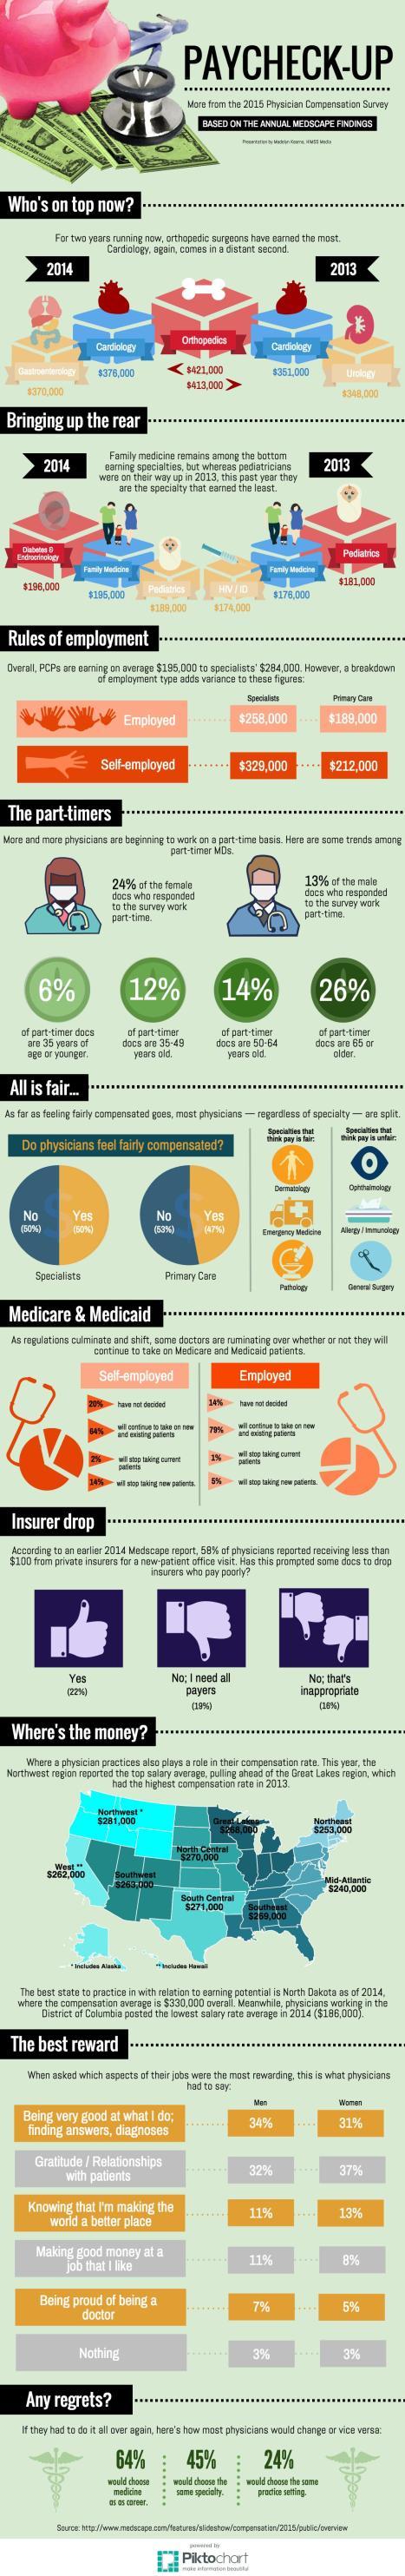 Medscape2015Report